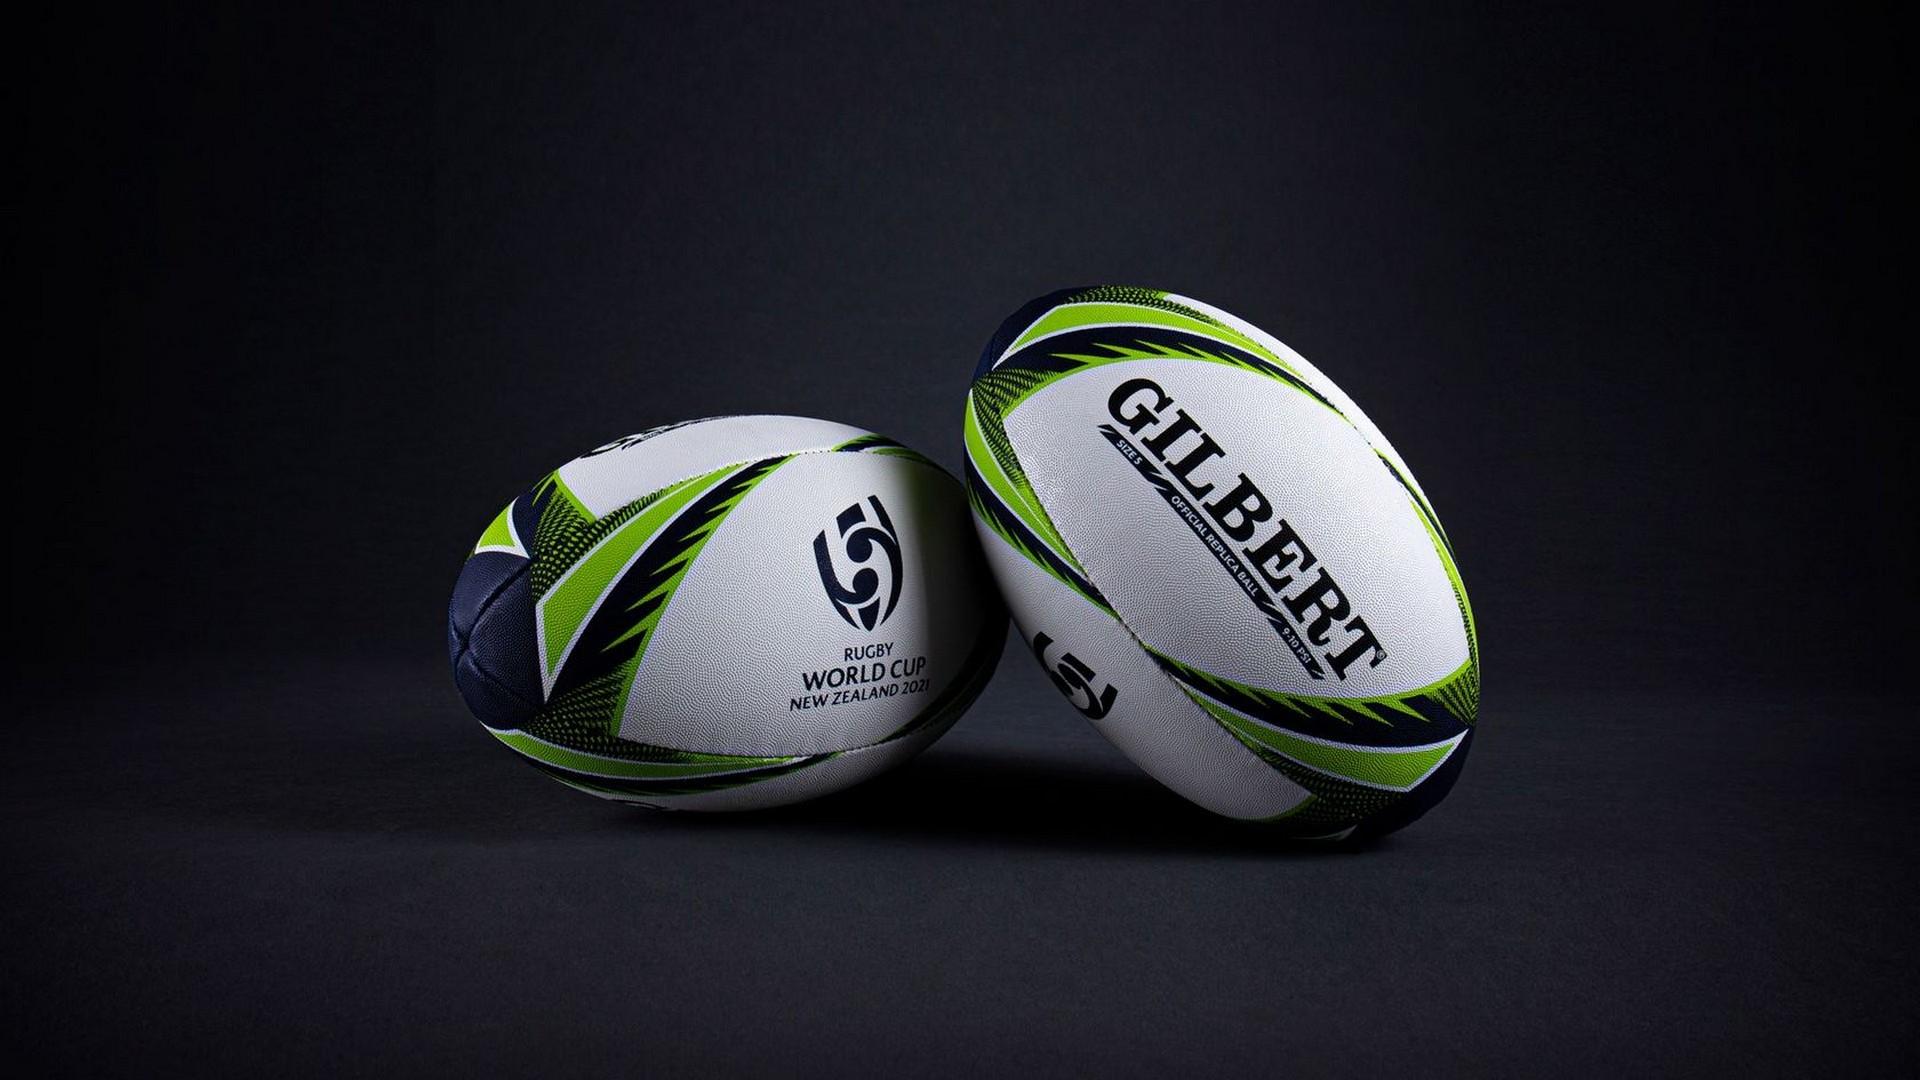 NZL 2021 RWC féminine (1) Ballon Gilbert